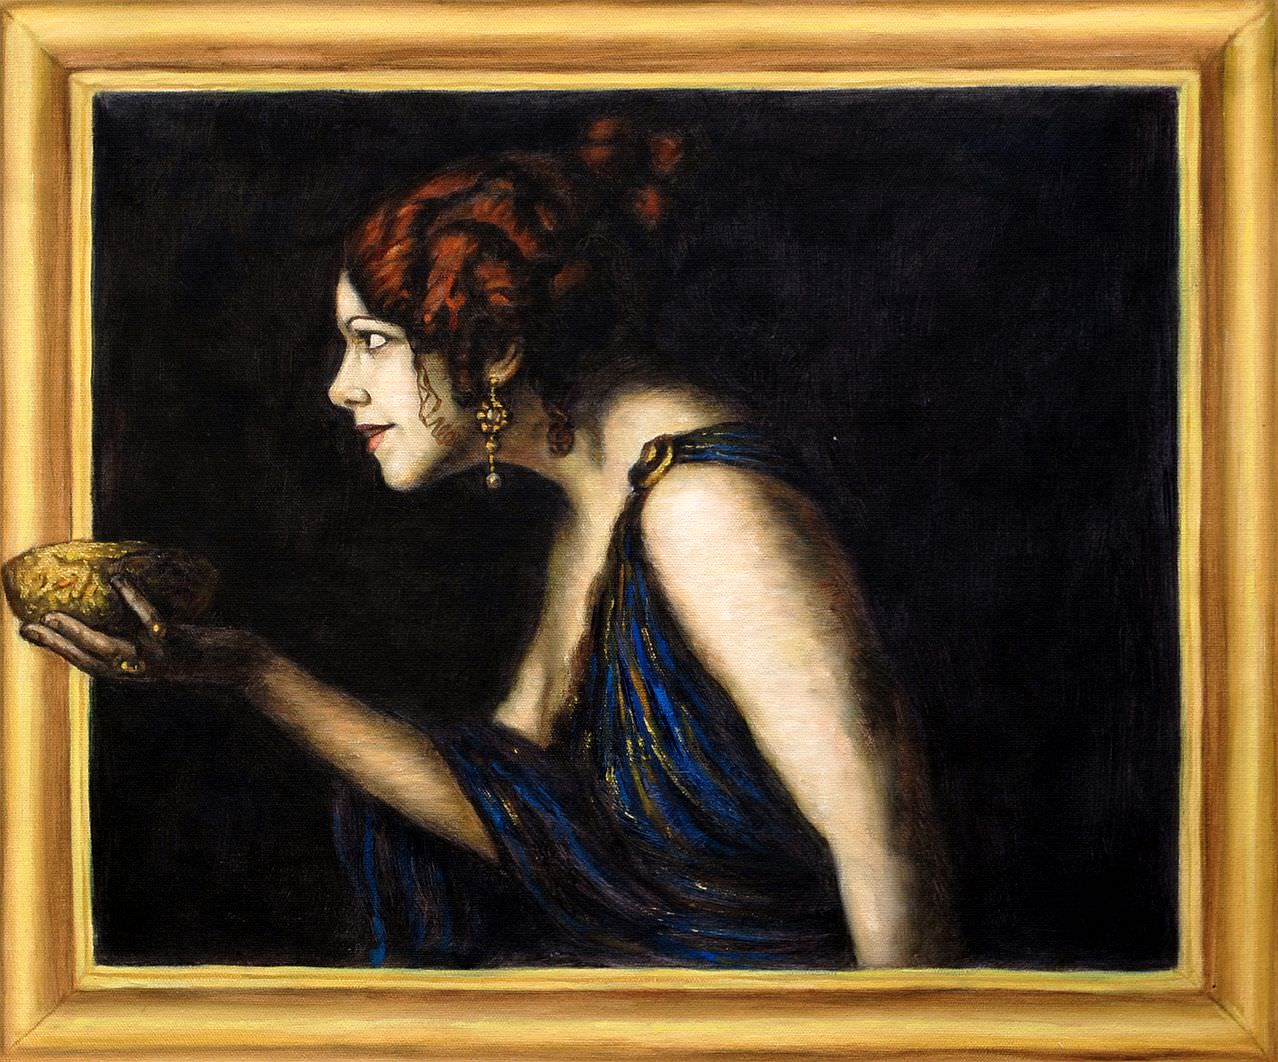 Franz von Stuck - Tilla Durieux als Circe 3d optik c95346 G 50x60cm edles Ölgemälde handgemalt Museumsqualität